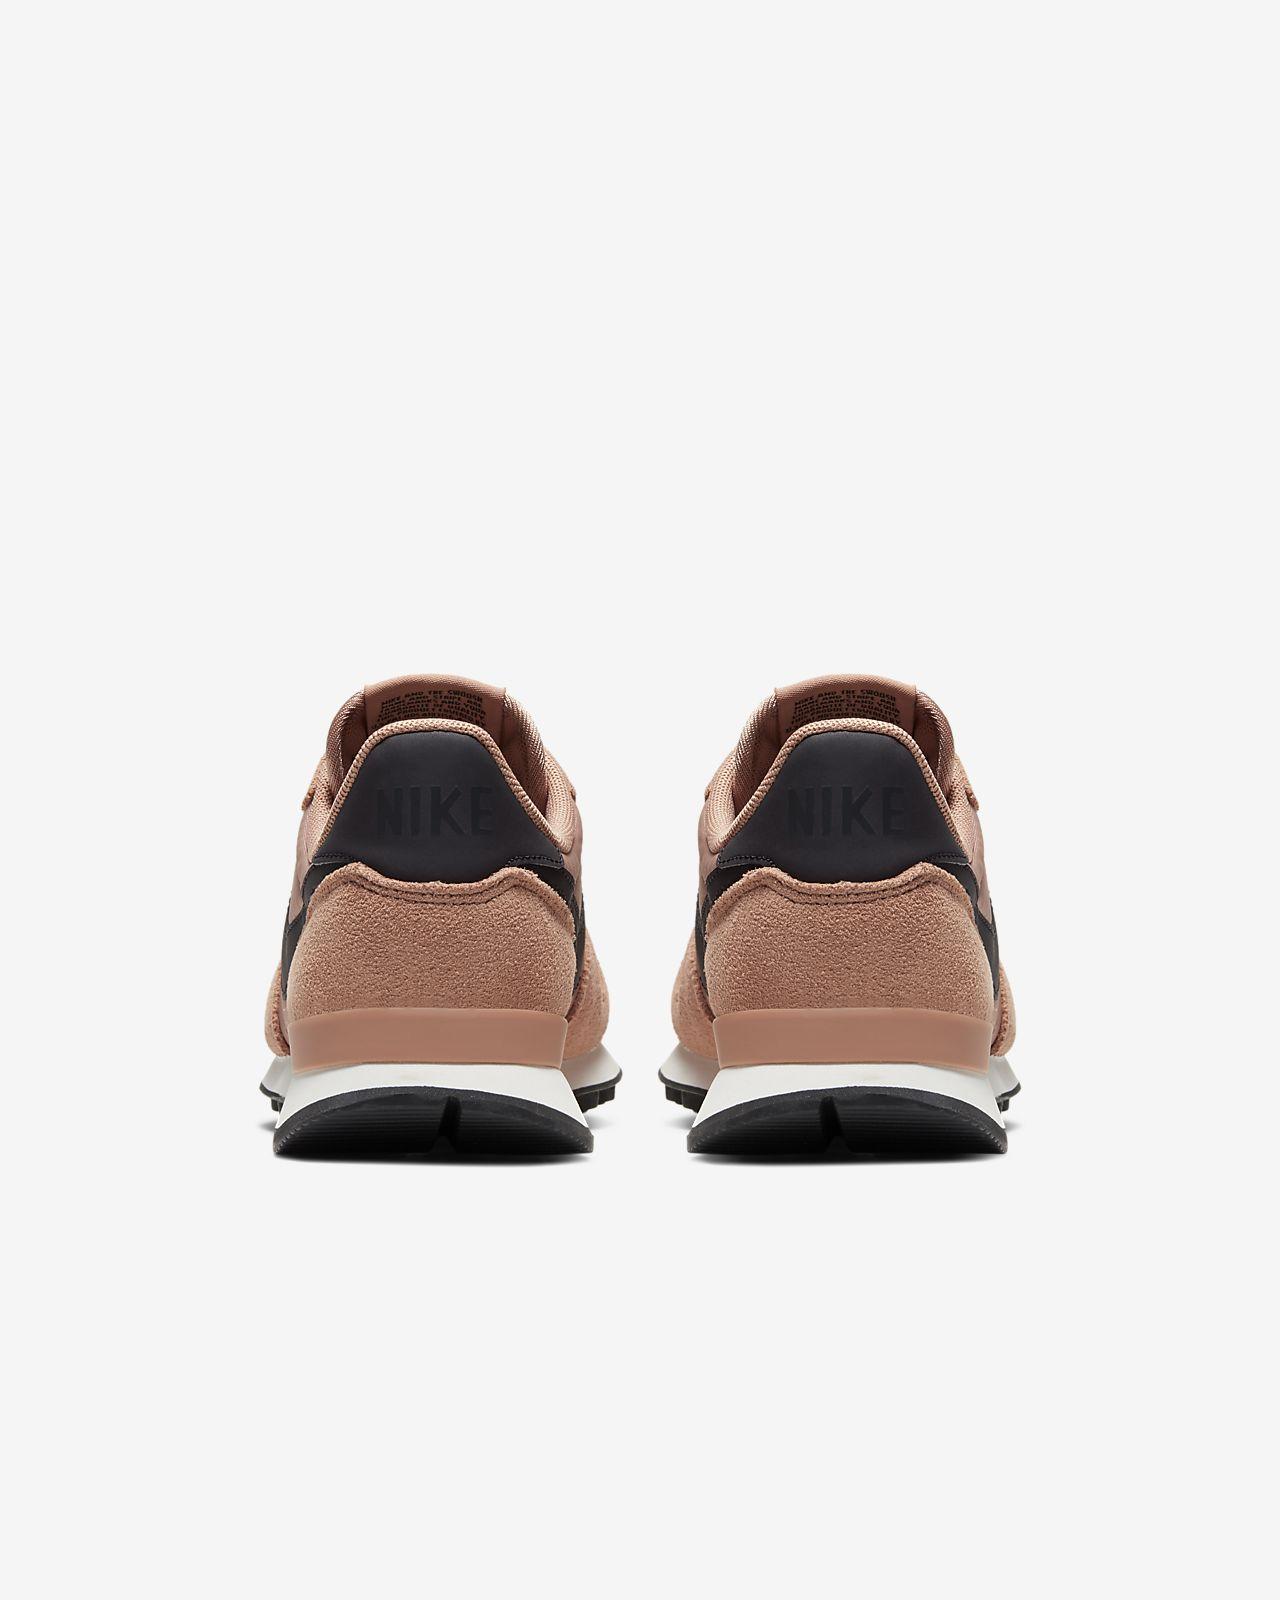 huge discount 4f0c9 da123 Low Resolution Sko Nike Internationalist för kvinnor Sko Nike  Internationalist för kvinnor